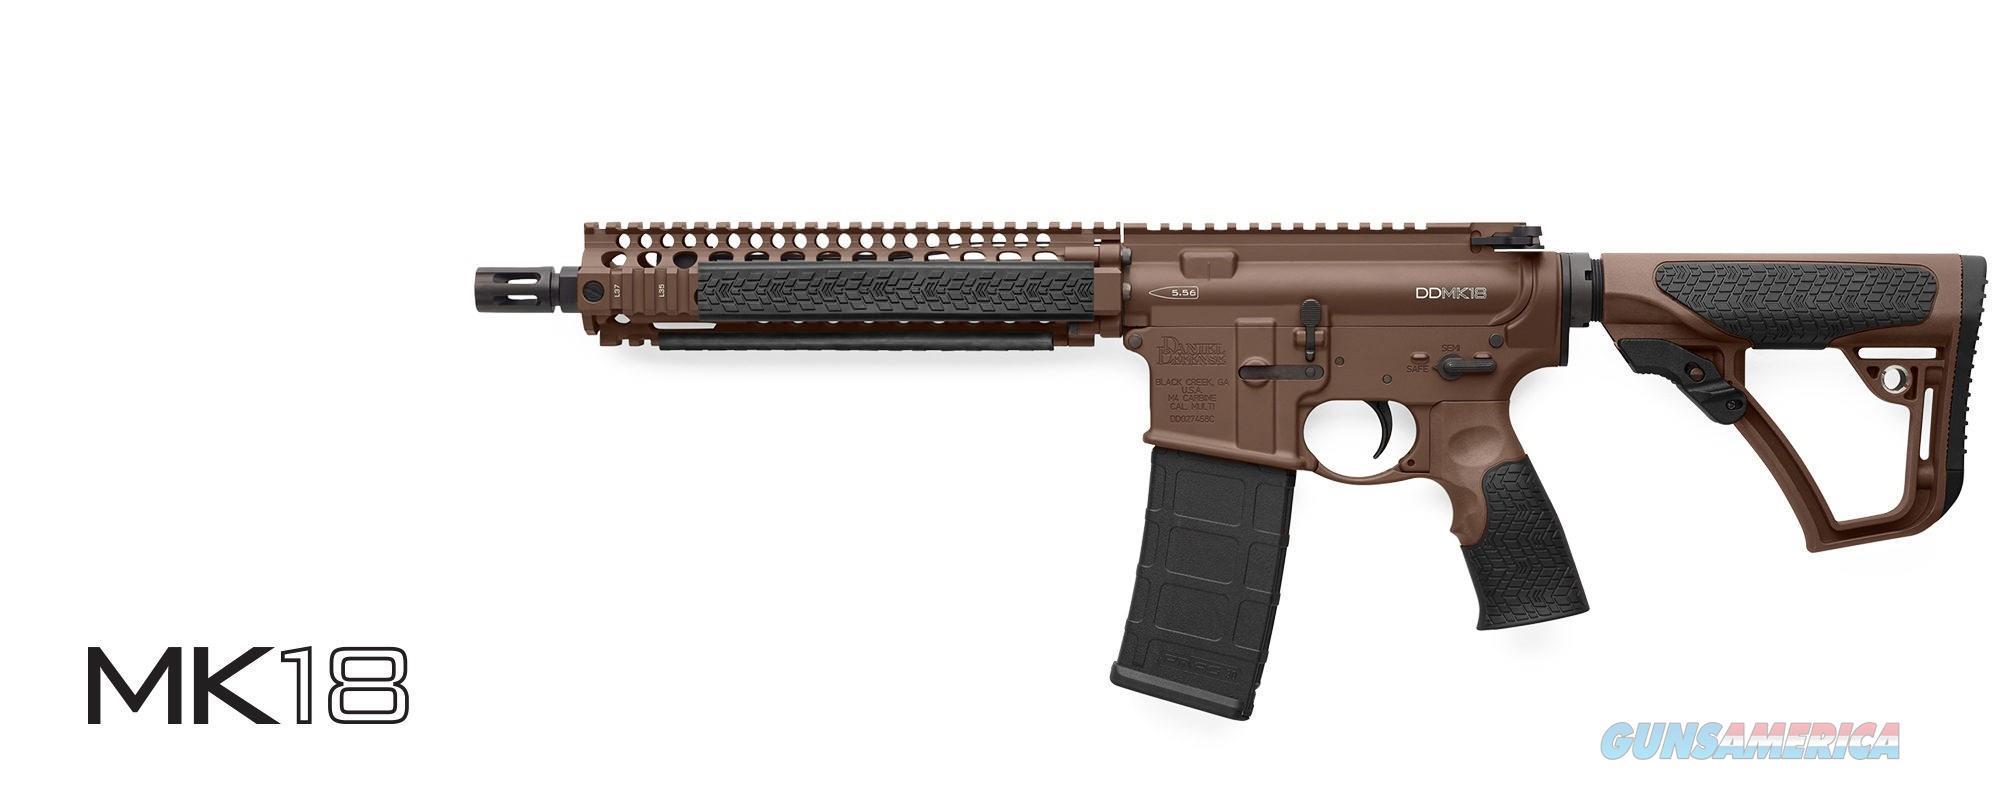 Daniel Defense Mk18 SBR 5.56 FDE 02-088-15028-011  Guns > Rifles > Daniel Defense > Complete Rifles